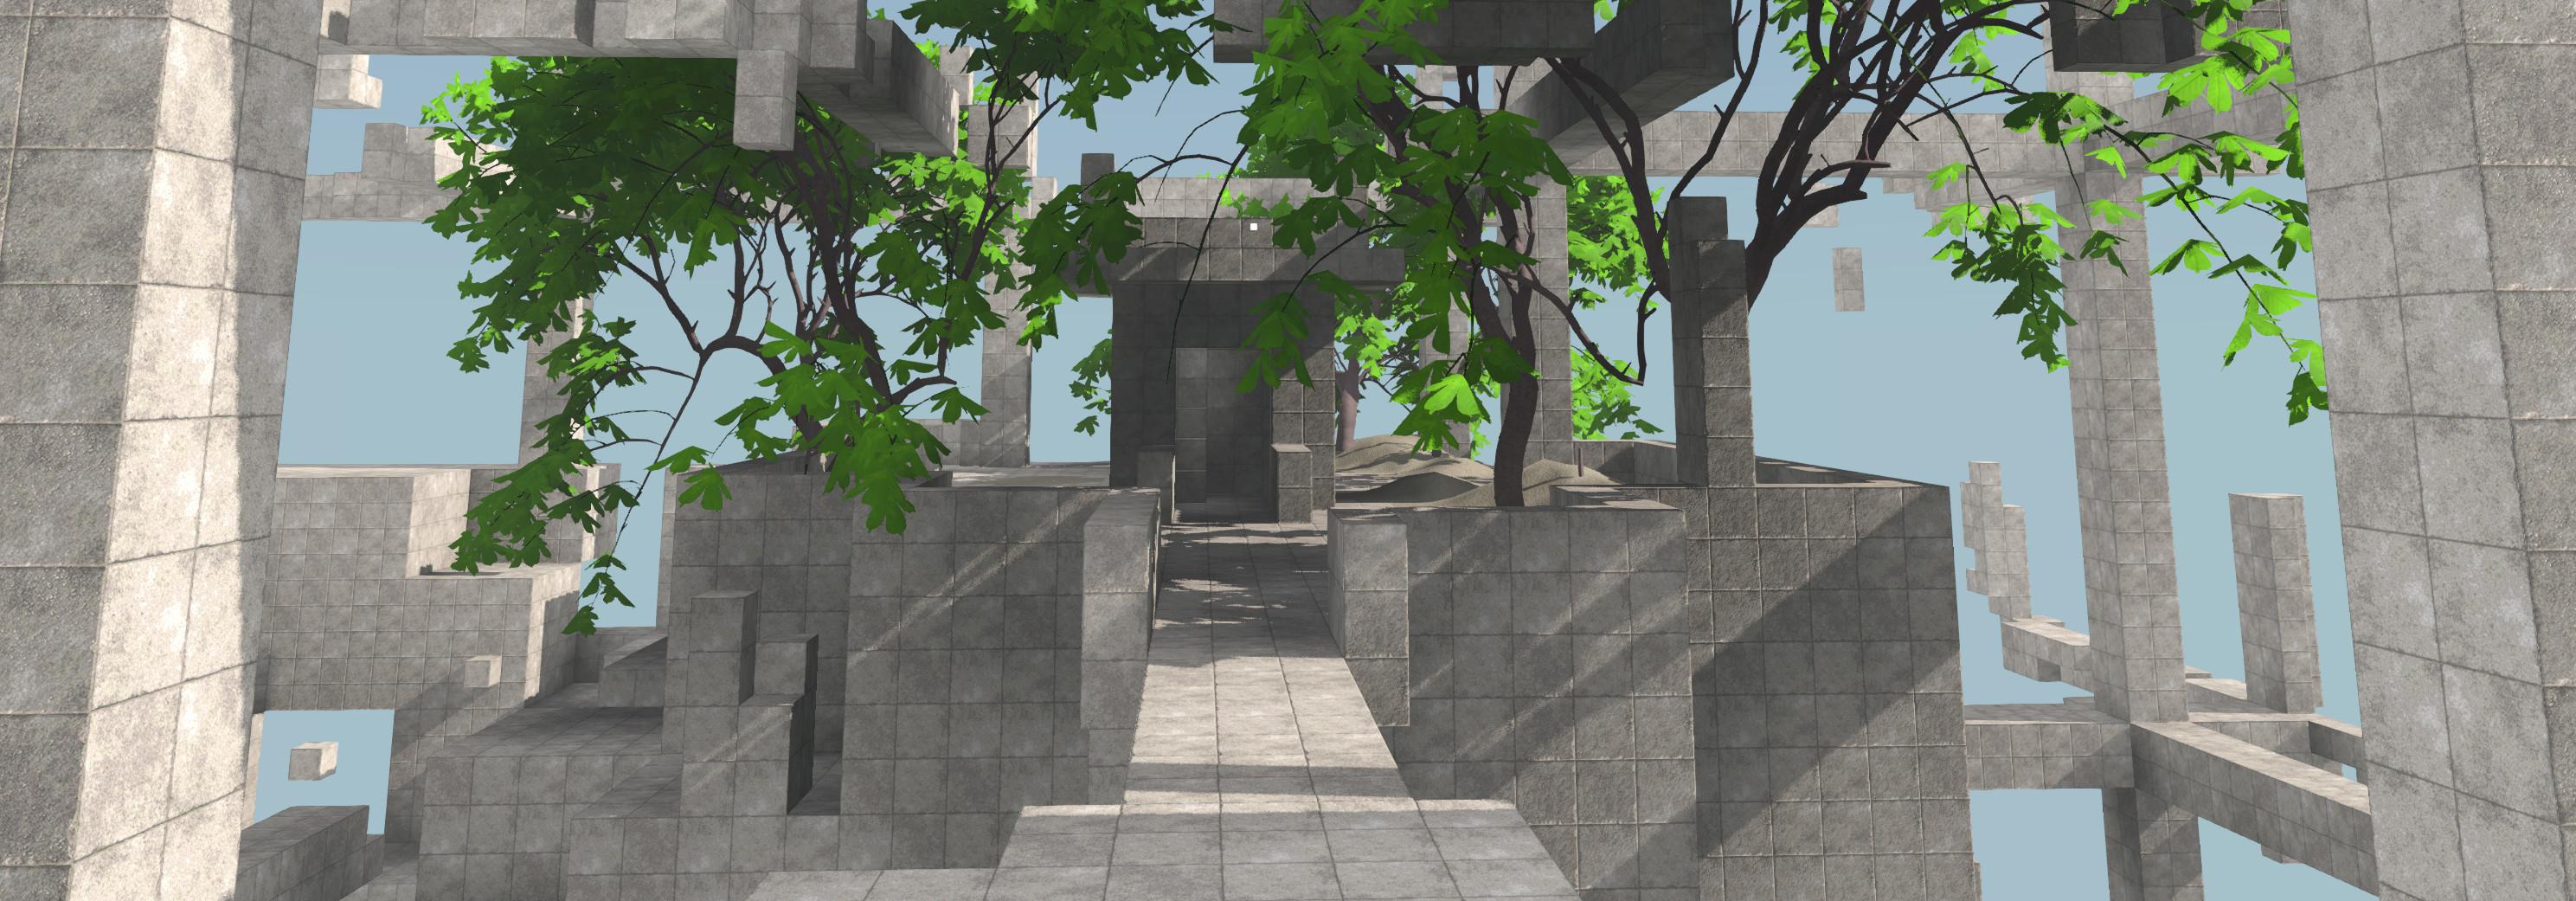 screenshot: buildings & trees